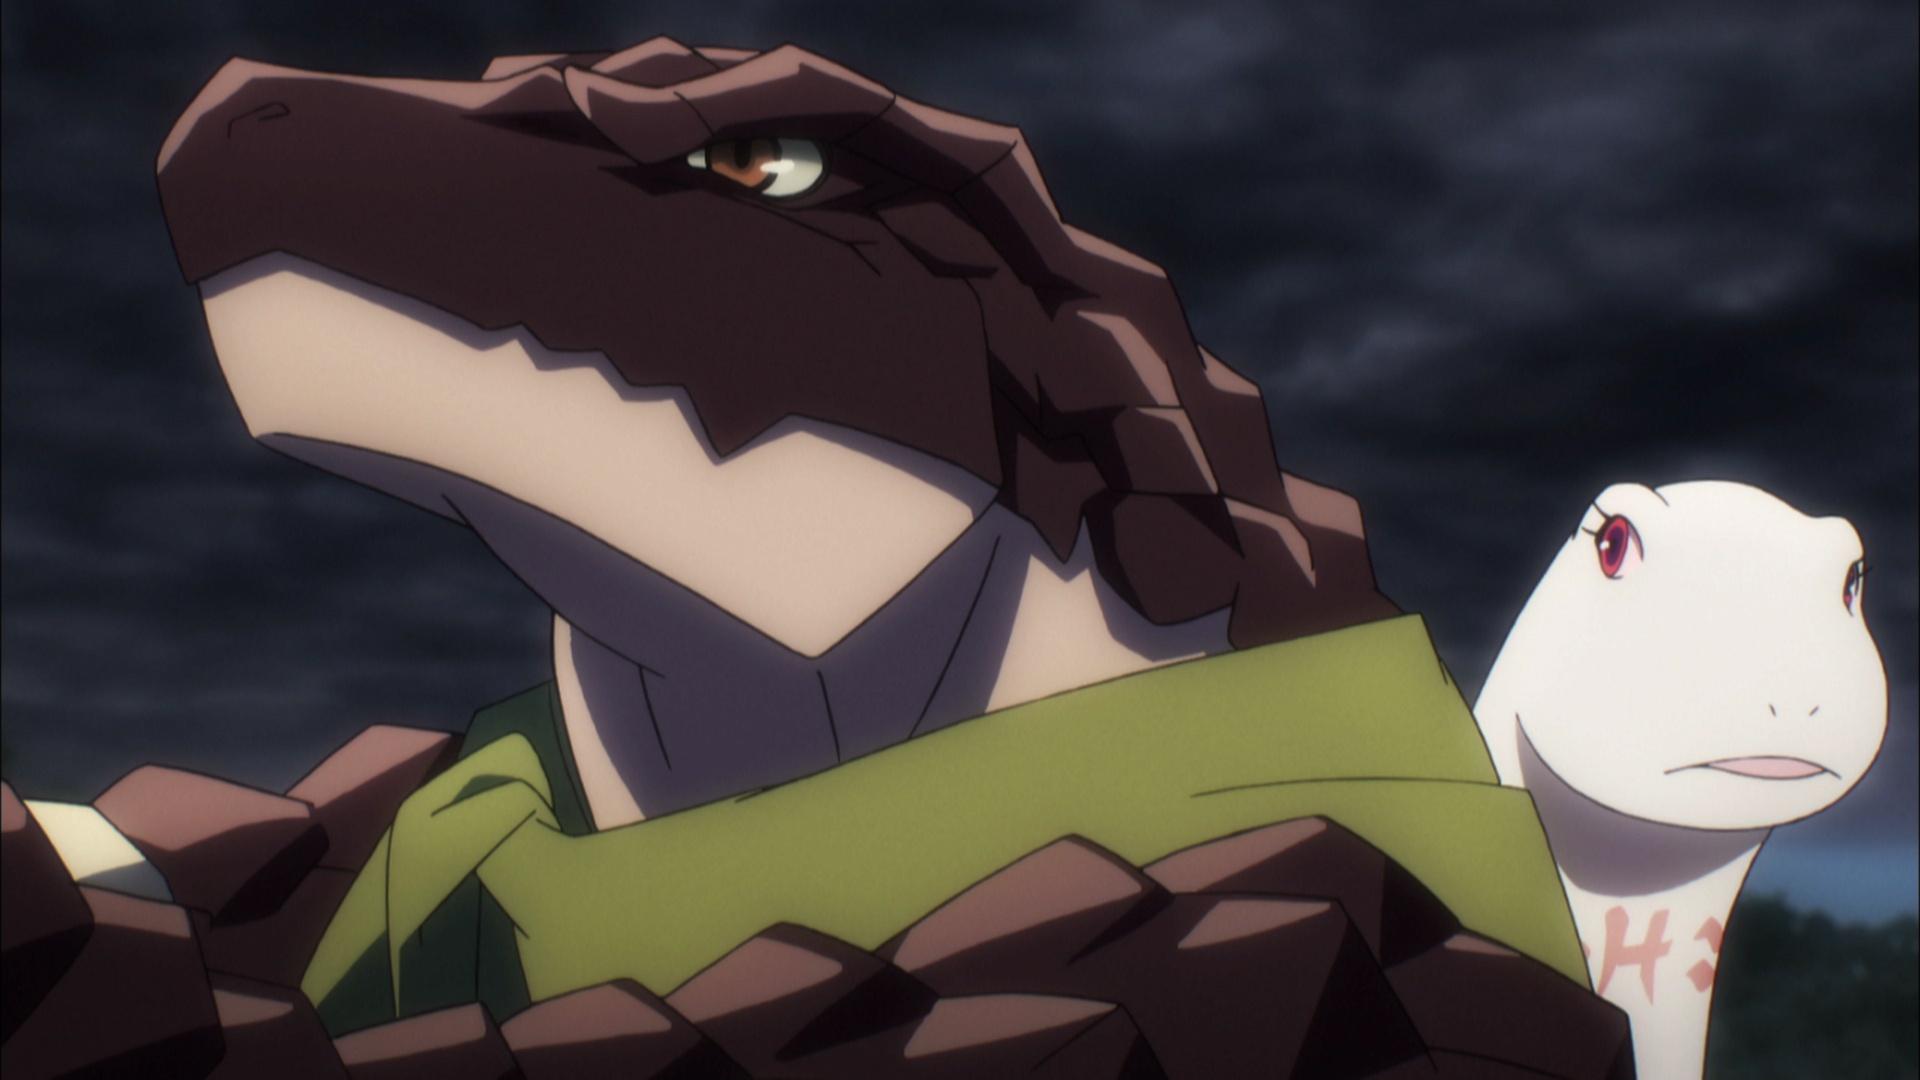 Watch Overlord Season 2 Episode 16 Sub & Dub | Anime Simulcast